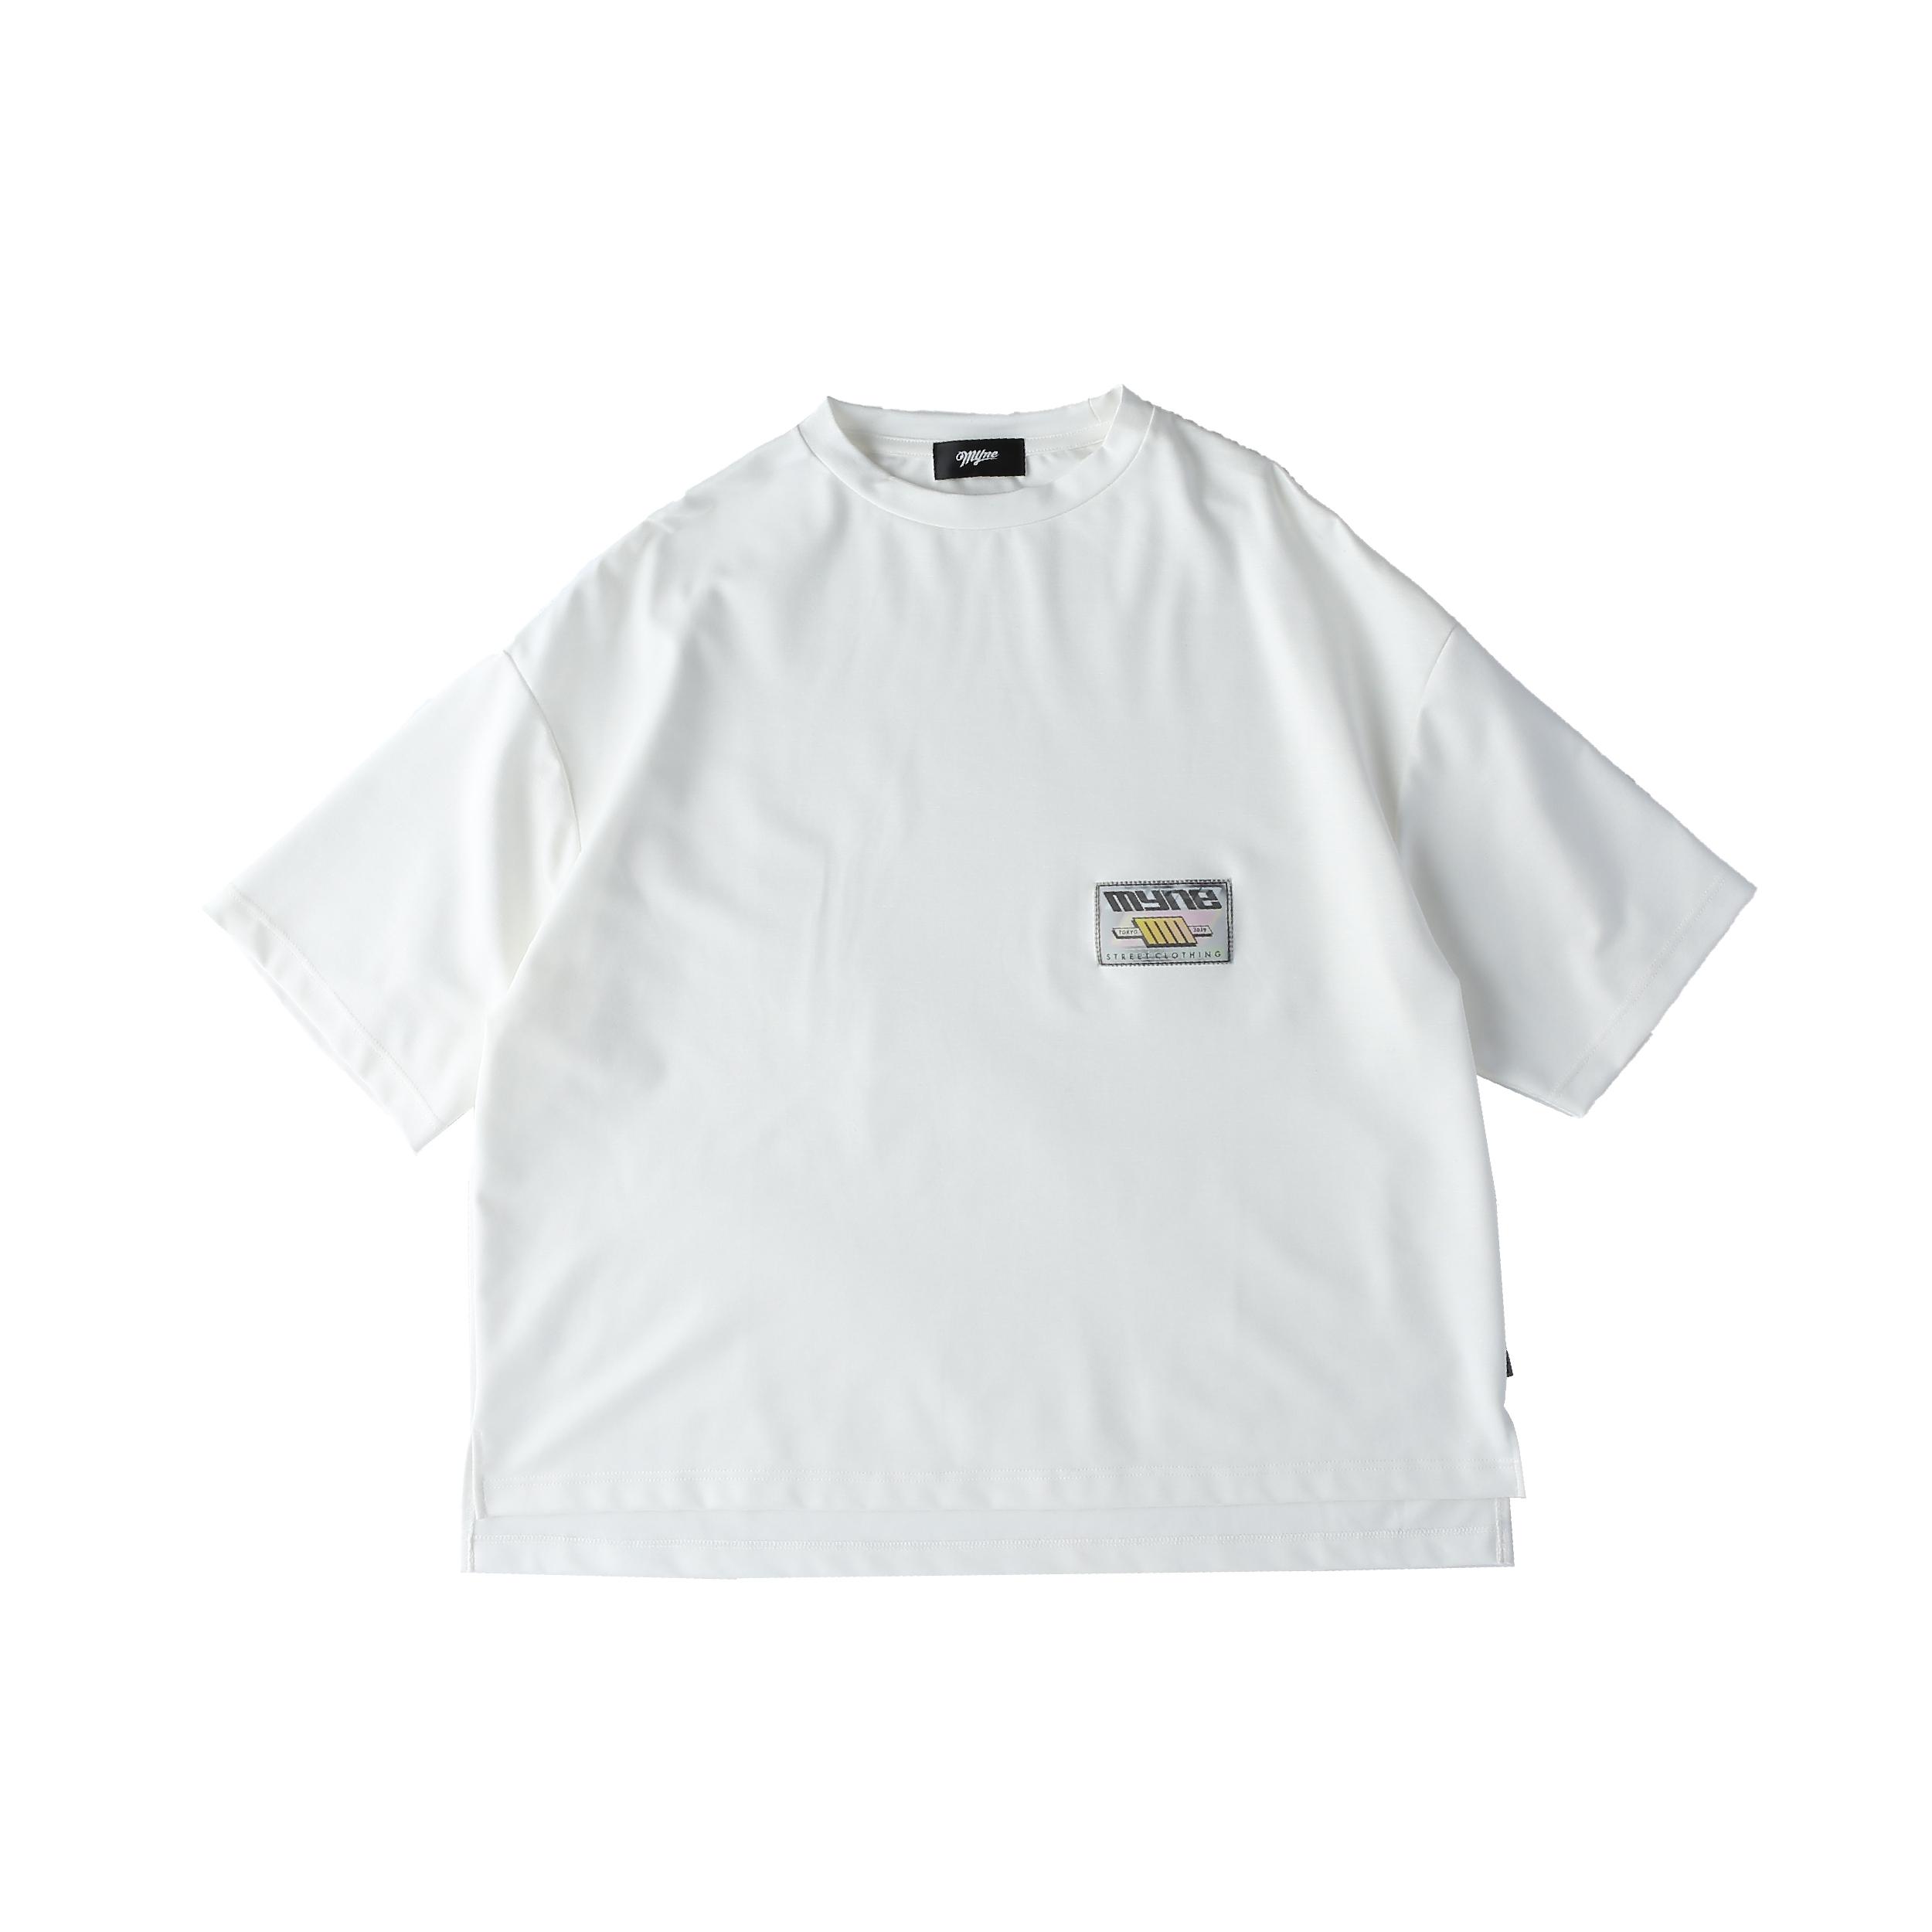 Wappen T-shirt / WHITE - 画像1